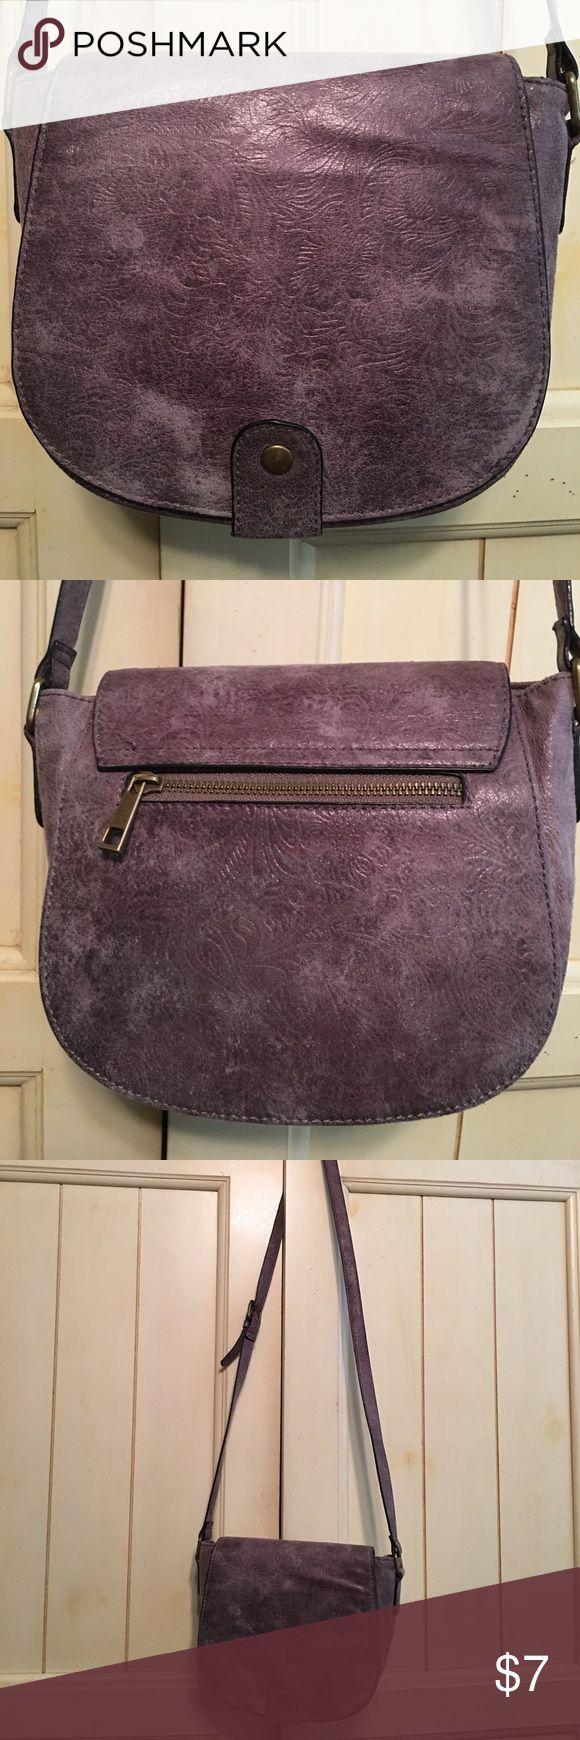 "Cute crossbody bag Gray lightly embossed PU saddle bag, magnetic closure, zip pocket in back, zip pocket & 2 slip pockets inside, 8-1/4""W x 7""H x 3-1/2""D, 22-1/2"" (at longest) adjustable strap drop, lovingly worn, needs a new home! Bags Crossbody Bags"